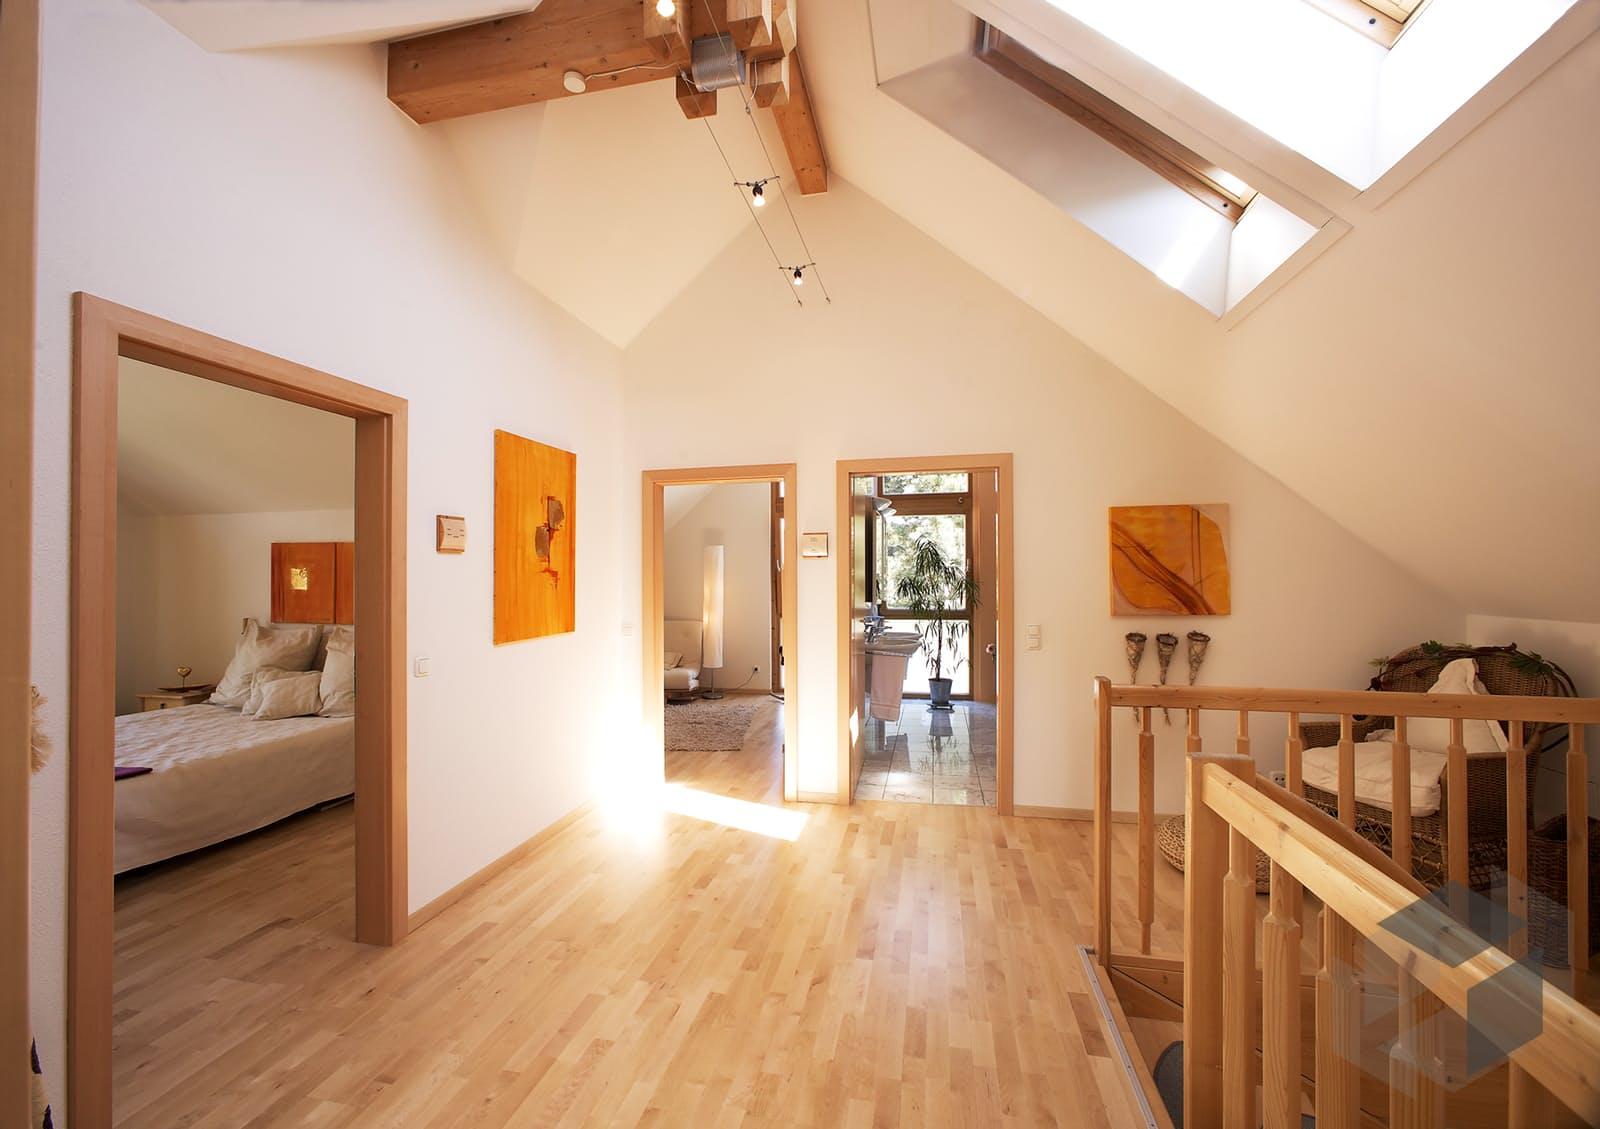 musterhaus bad vilbel inactive von nordhaus fertigbau komplette daten bersicht. Black Bedroom Furniture Sets. Home Design Ideas